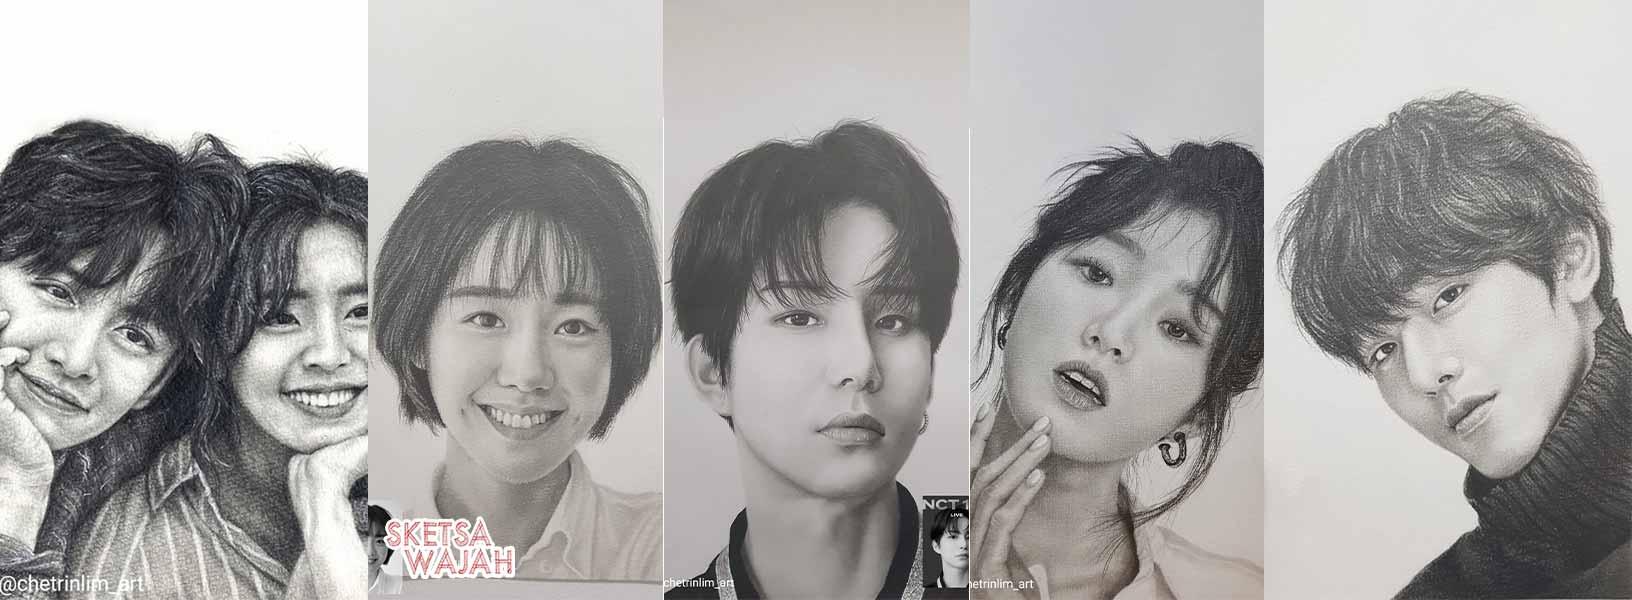 Karya Chetrin Lim sketcher Sketsa Wajah